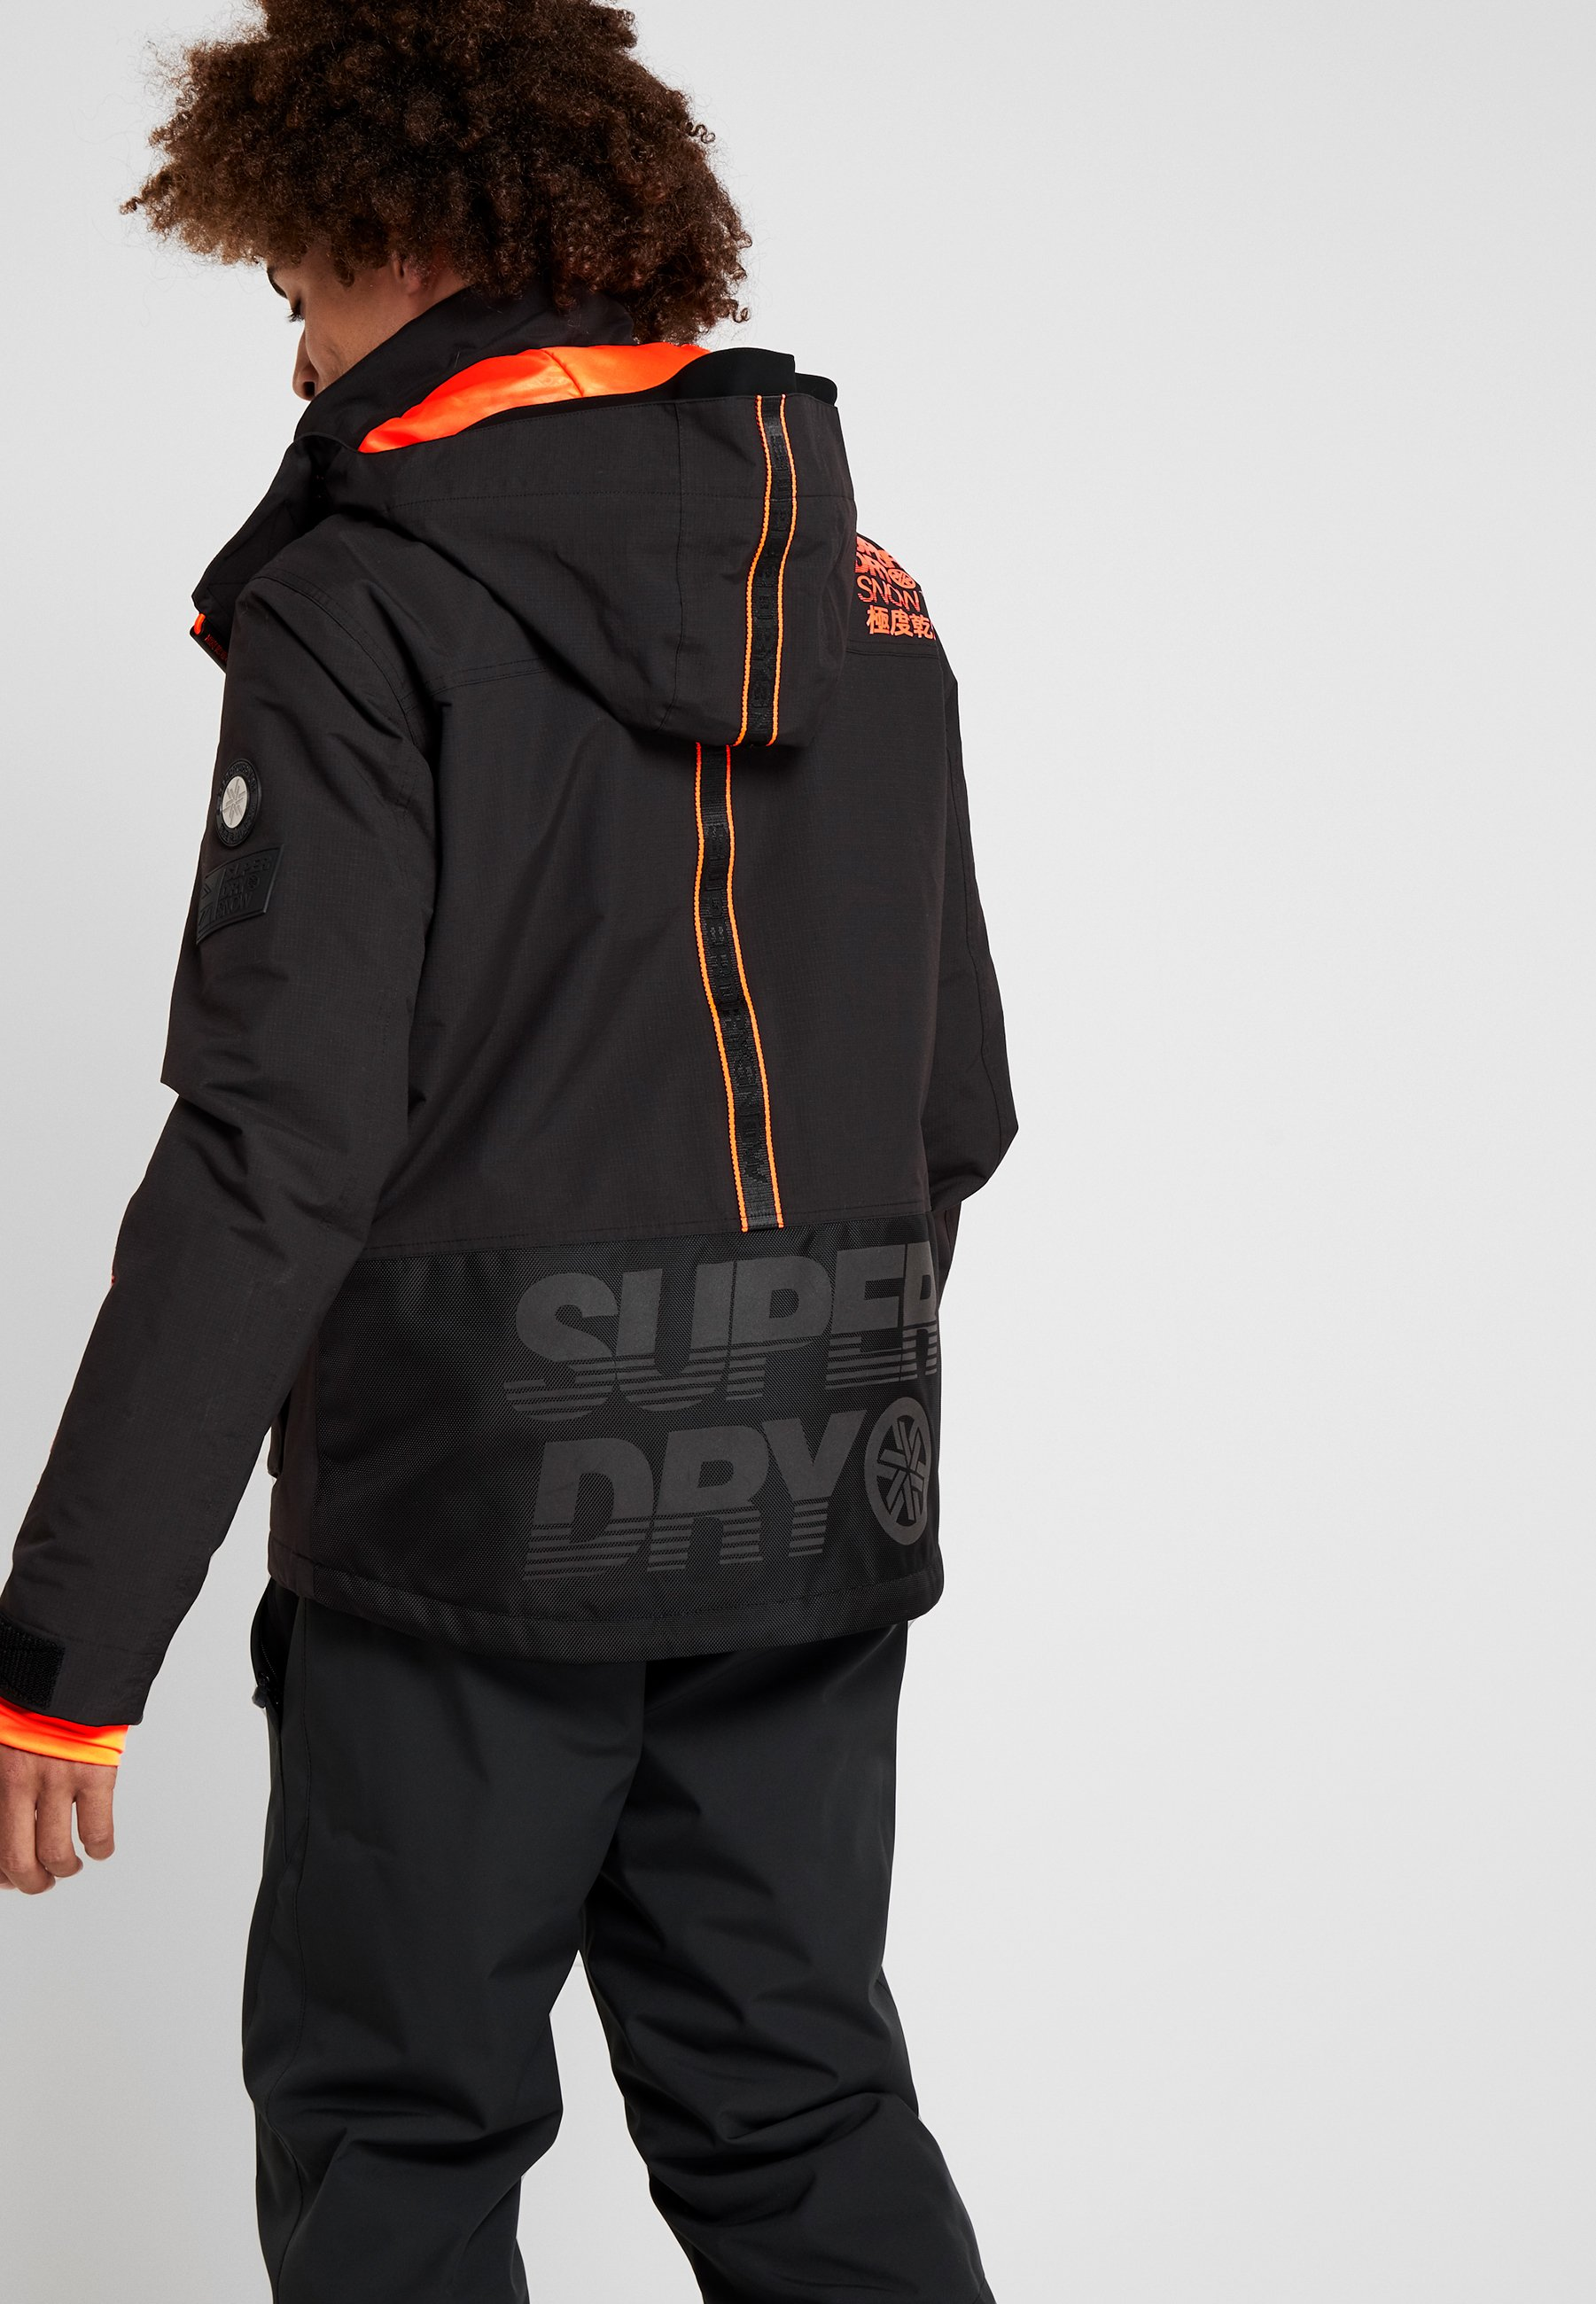 ULTIMATE SNOW RESCUE Snowboardjacke onyx black